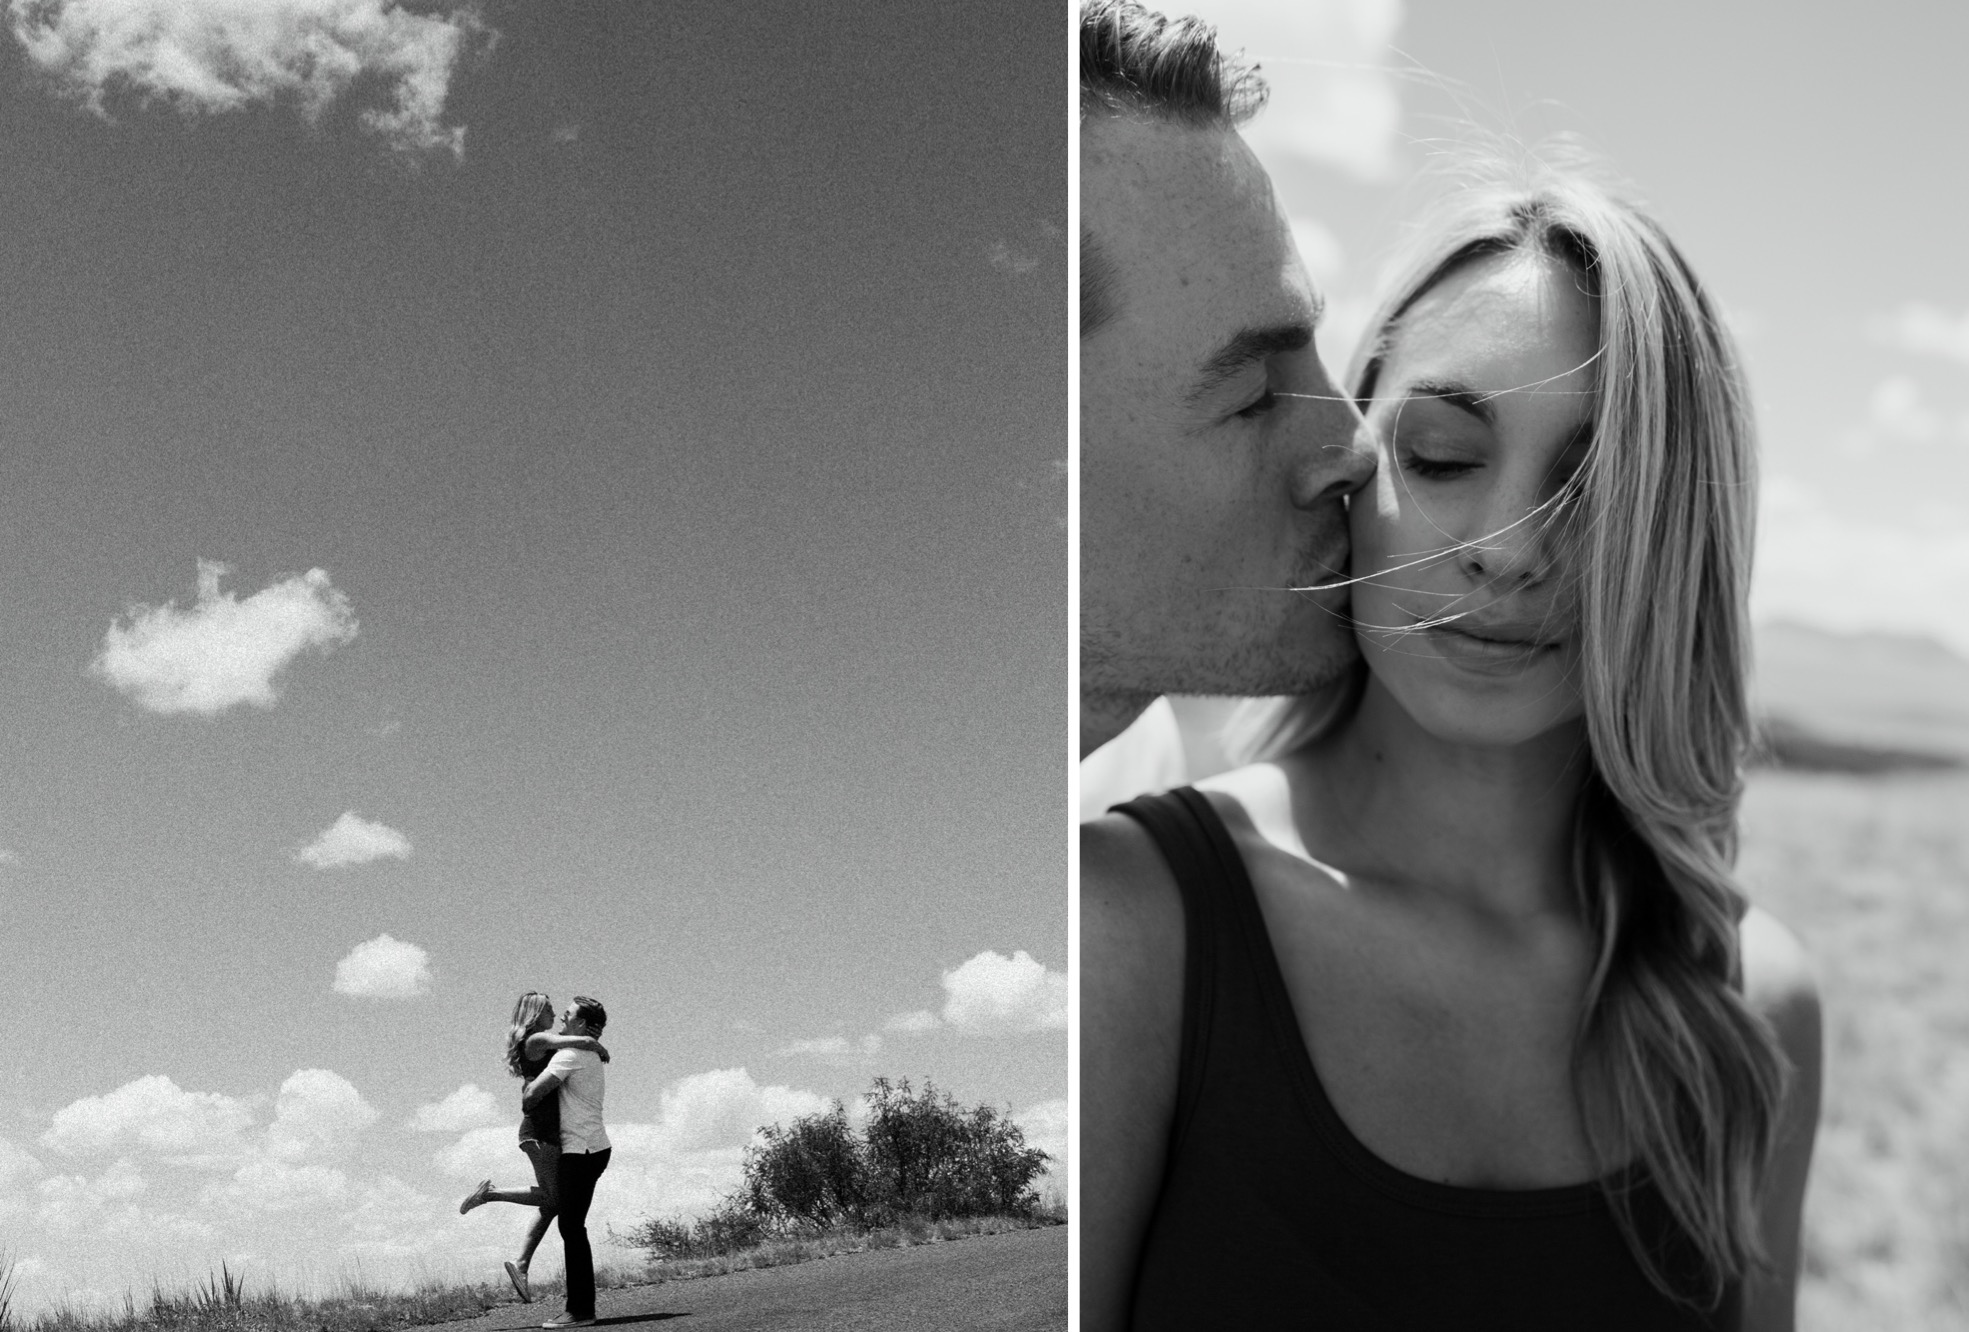 76_Marfa-Texas-Engagement-Jessica-Sherrell-82_Marfa-Texas-Engagement-Jessica-Sherrell-23.jpg